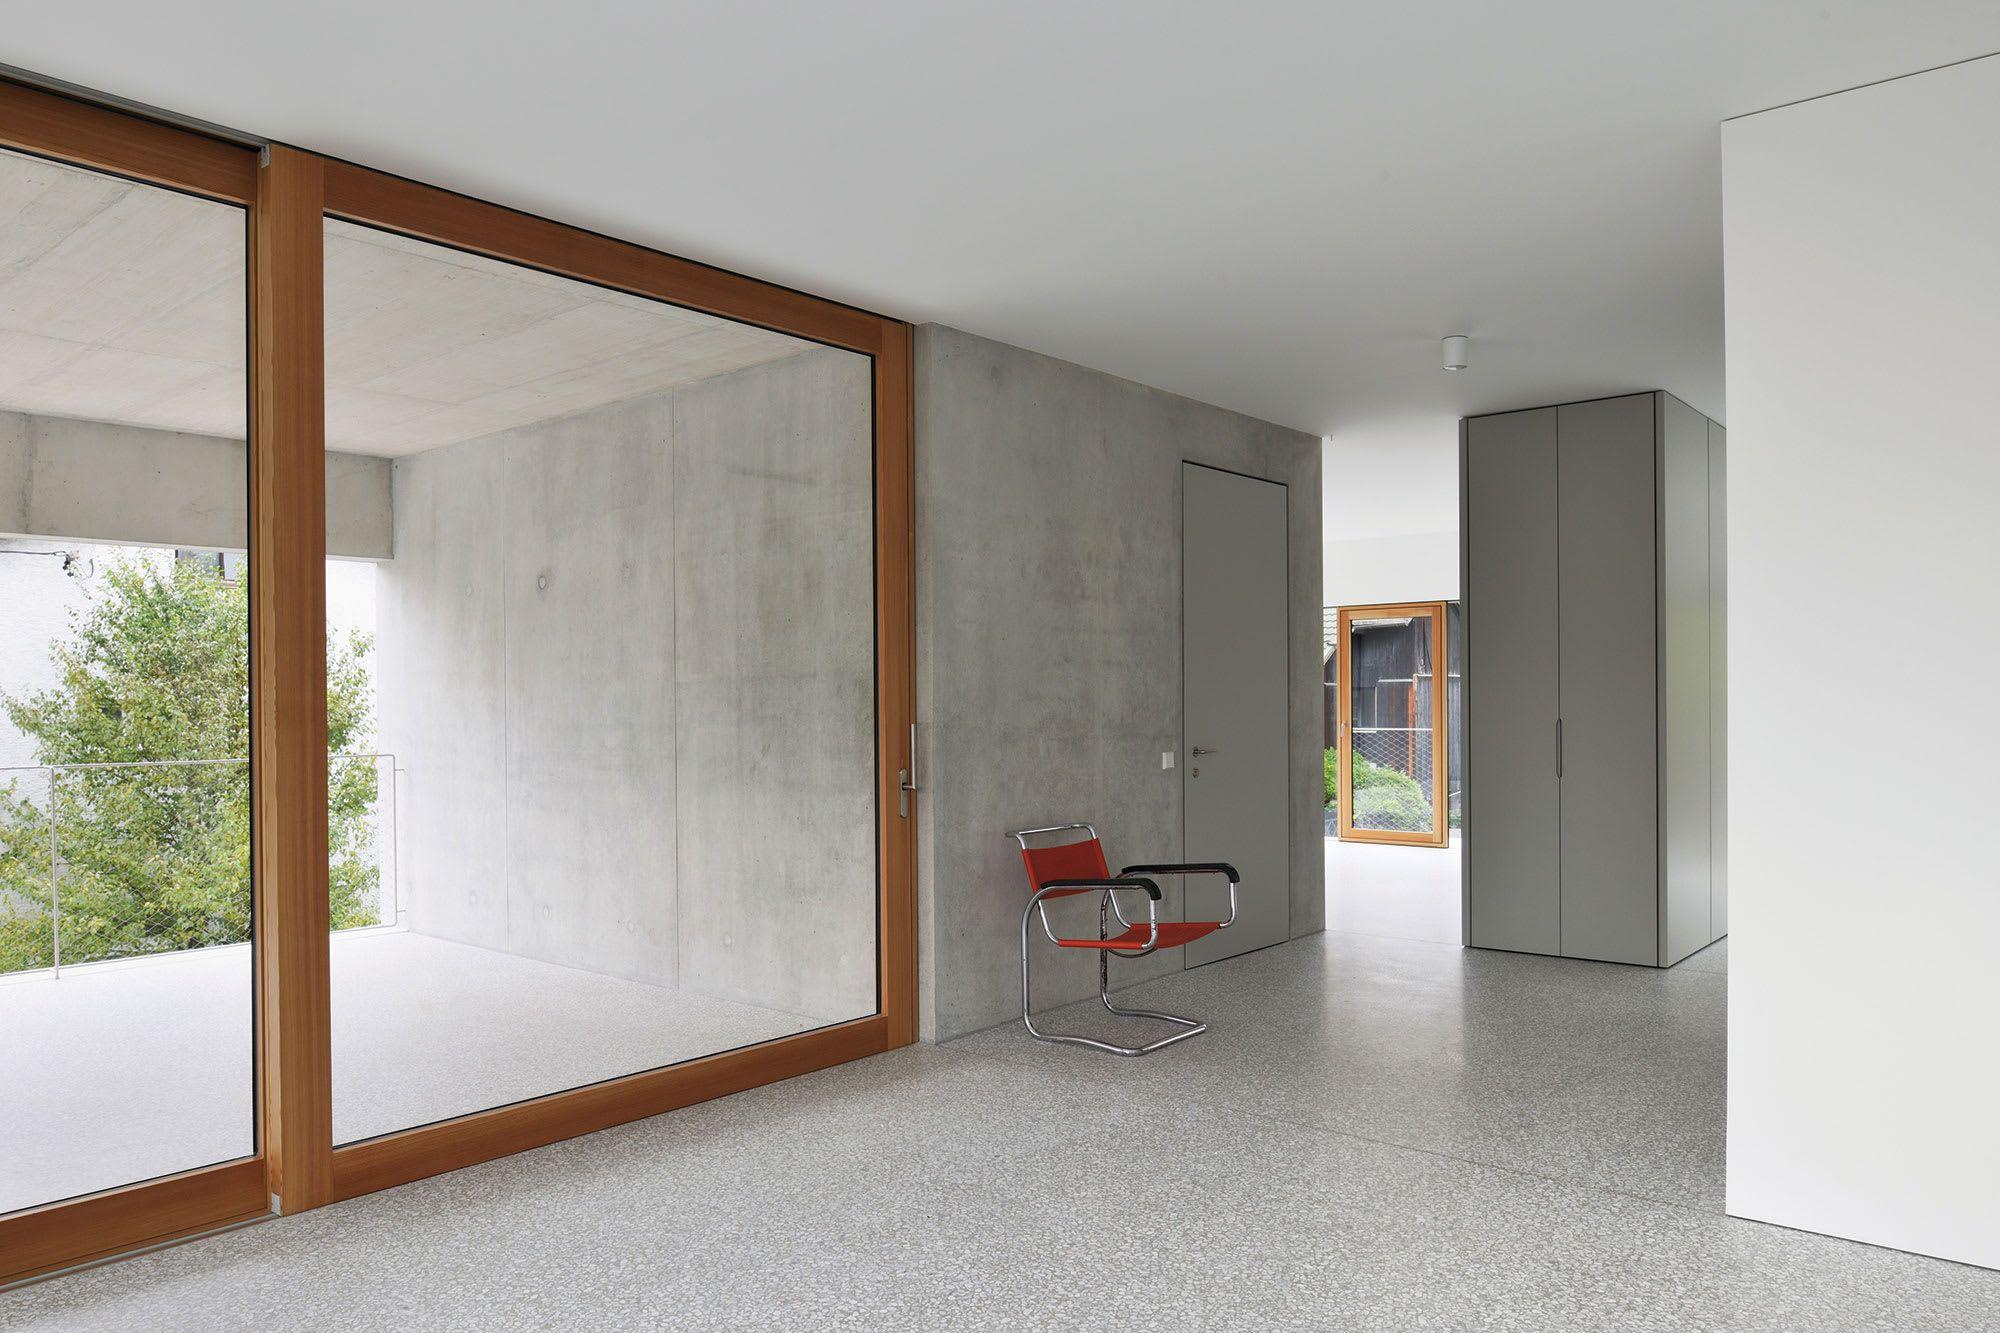 Bevk Perovic Arhitekti Miran Kambic Apartment Building Prule Divisare In 2020 House Apartment Building Interior Architecture